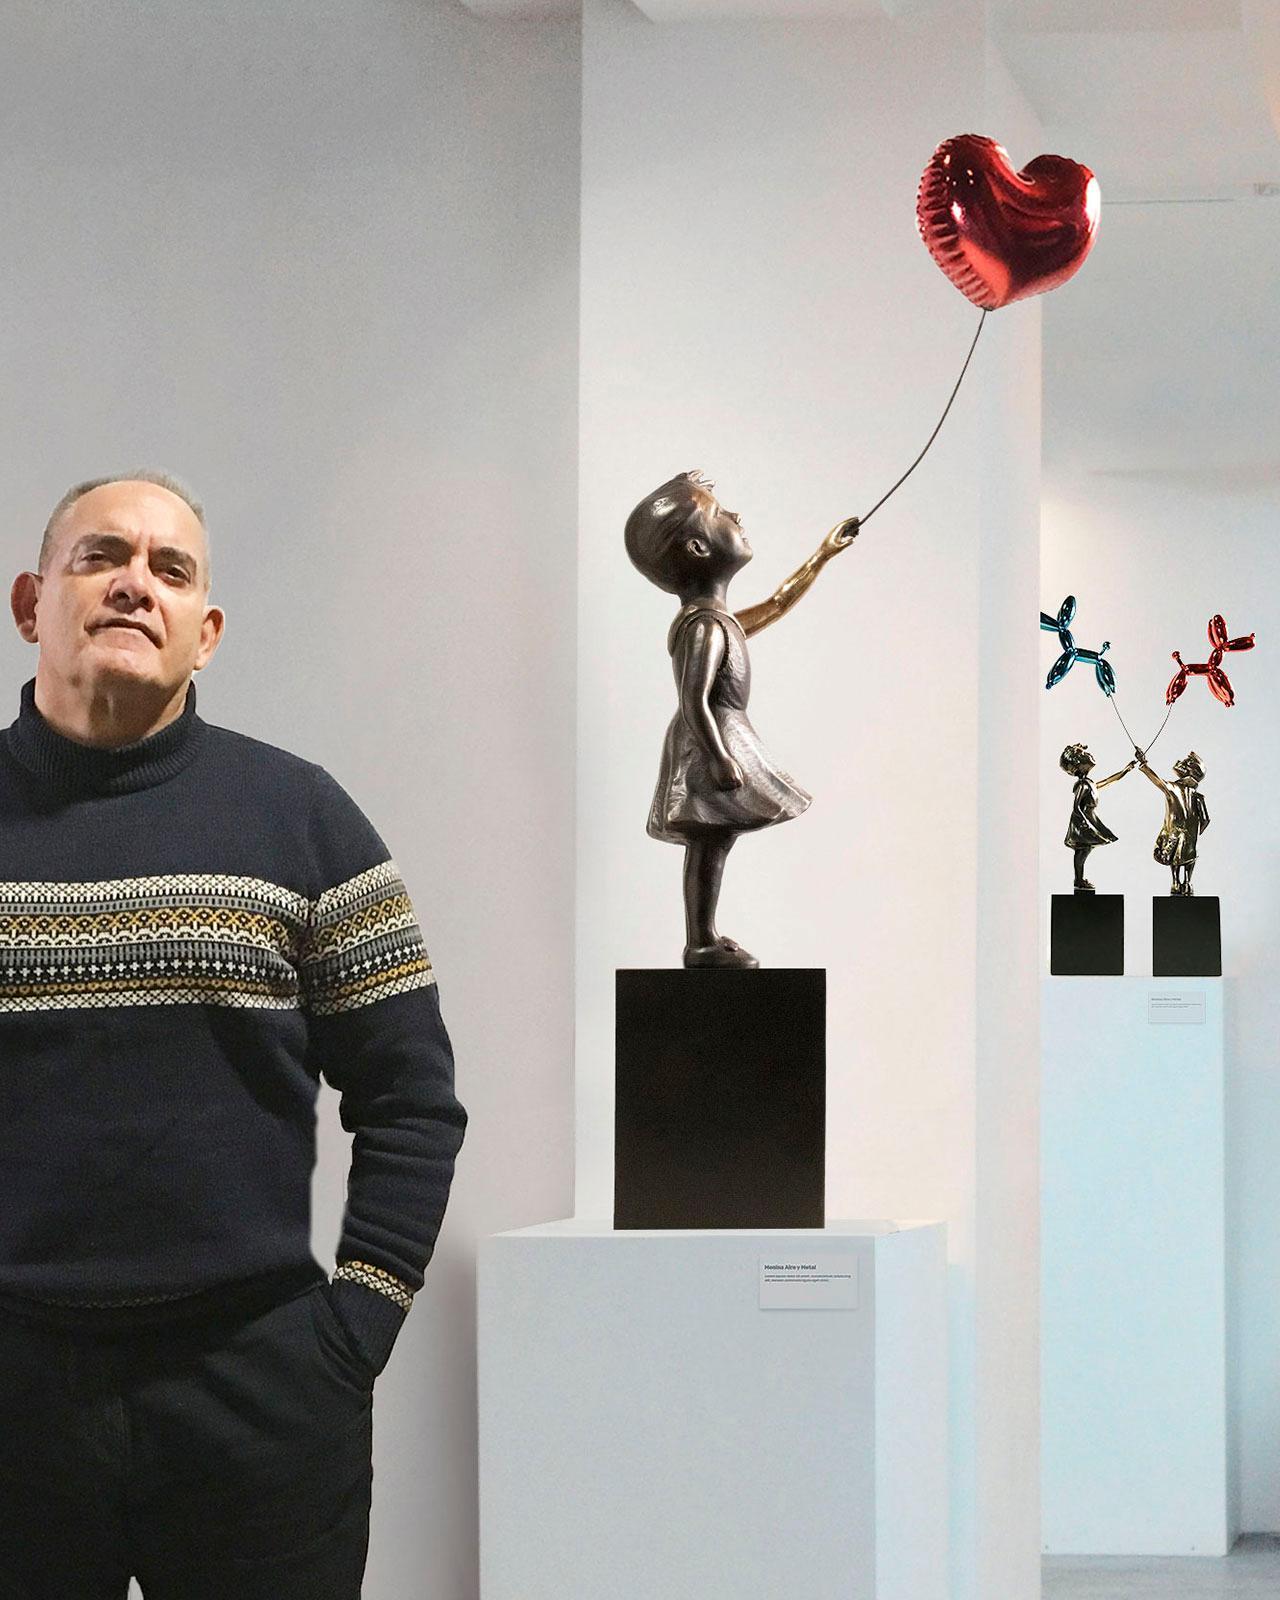 Girl with balloon 74 – Miguel Guía Street Art Cast bronze Sculpture Big